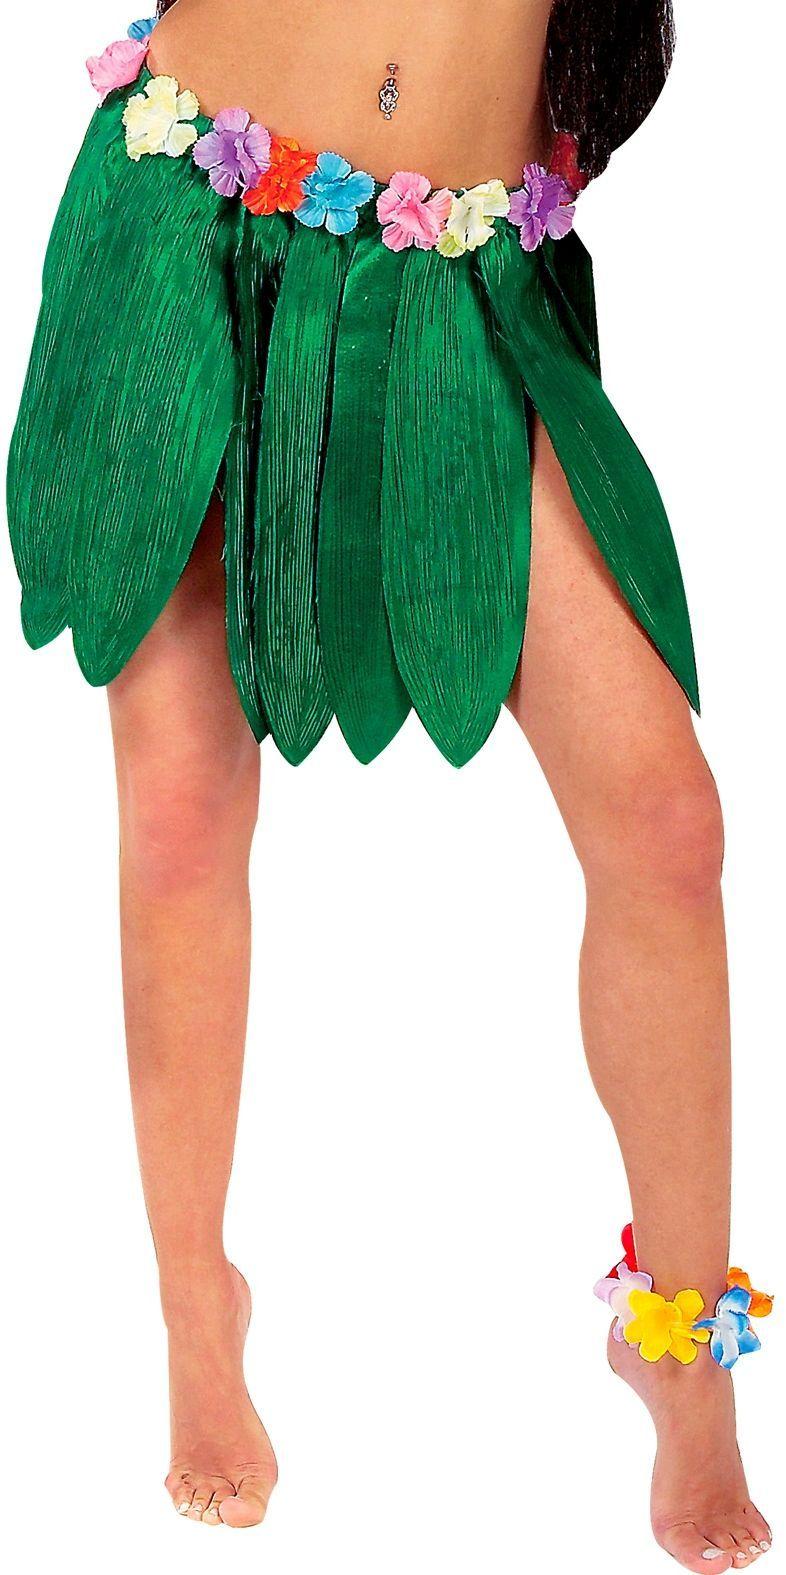 Hawaii bananen blad rokje